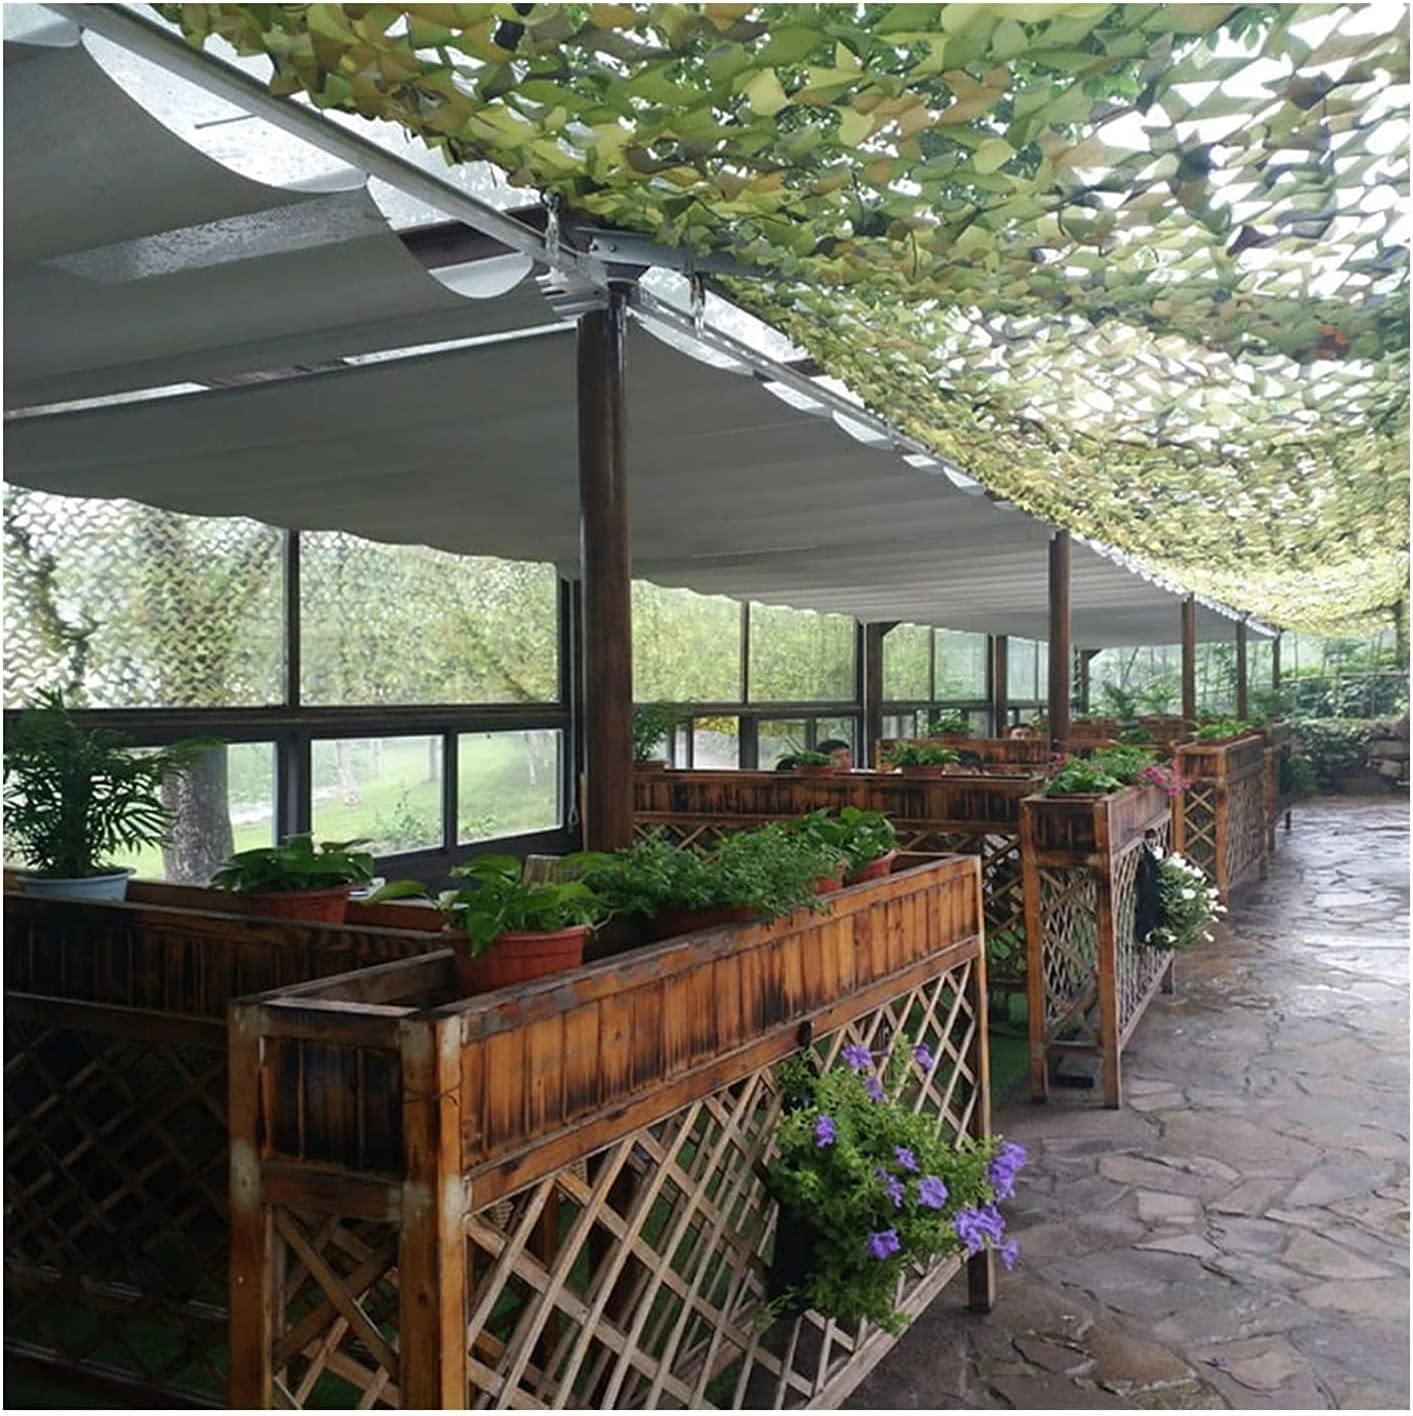 KANULAN Retractable pergola Canopy Outdoor Many popular brands Patio Sha Over item handling